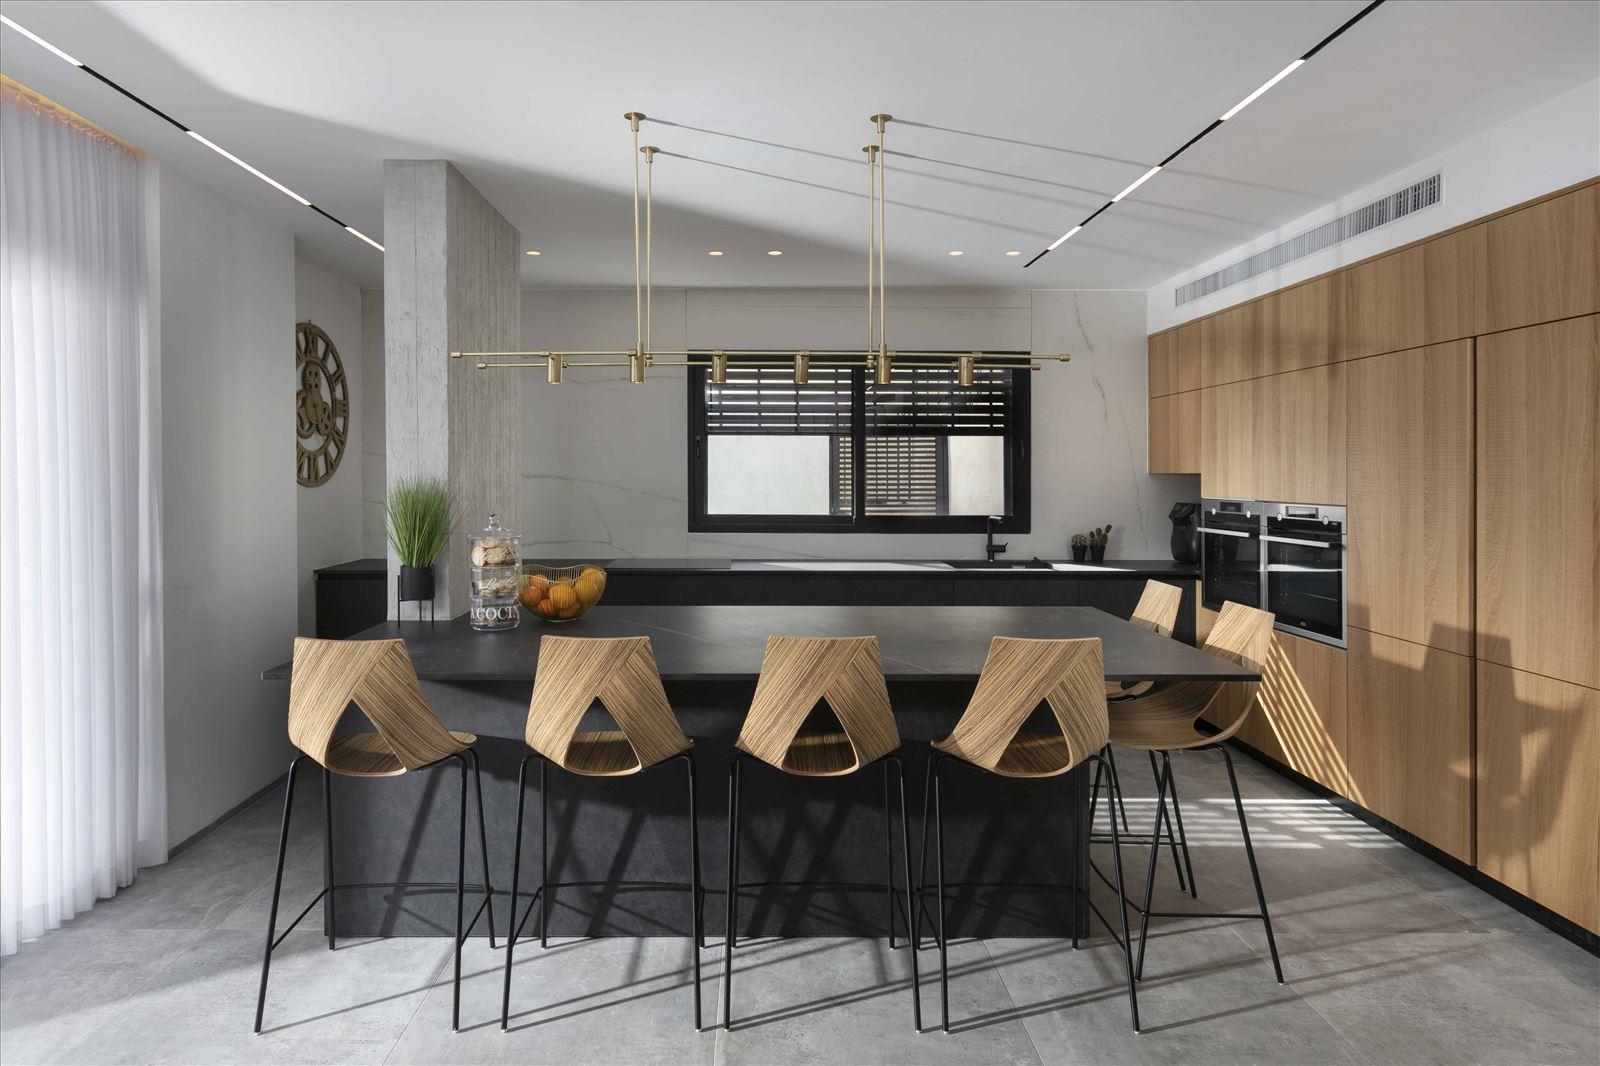 Lighting project private house תאורה מרהיבה במטבח על ידי דורי קמחי